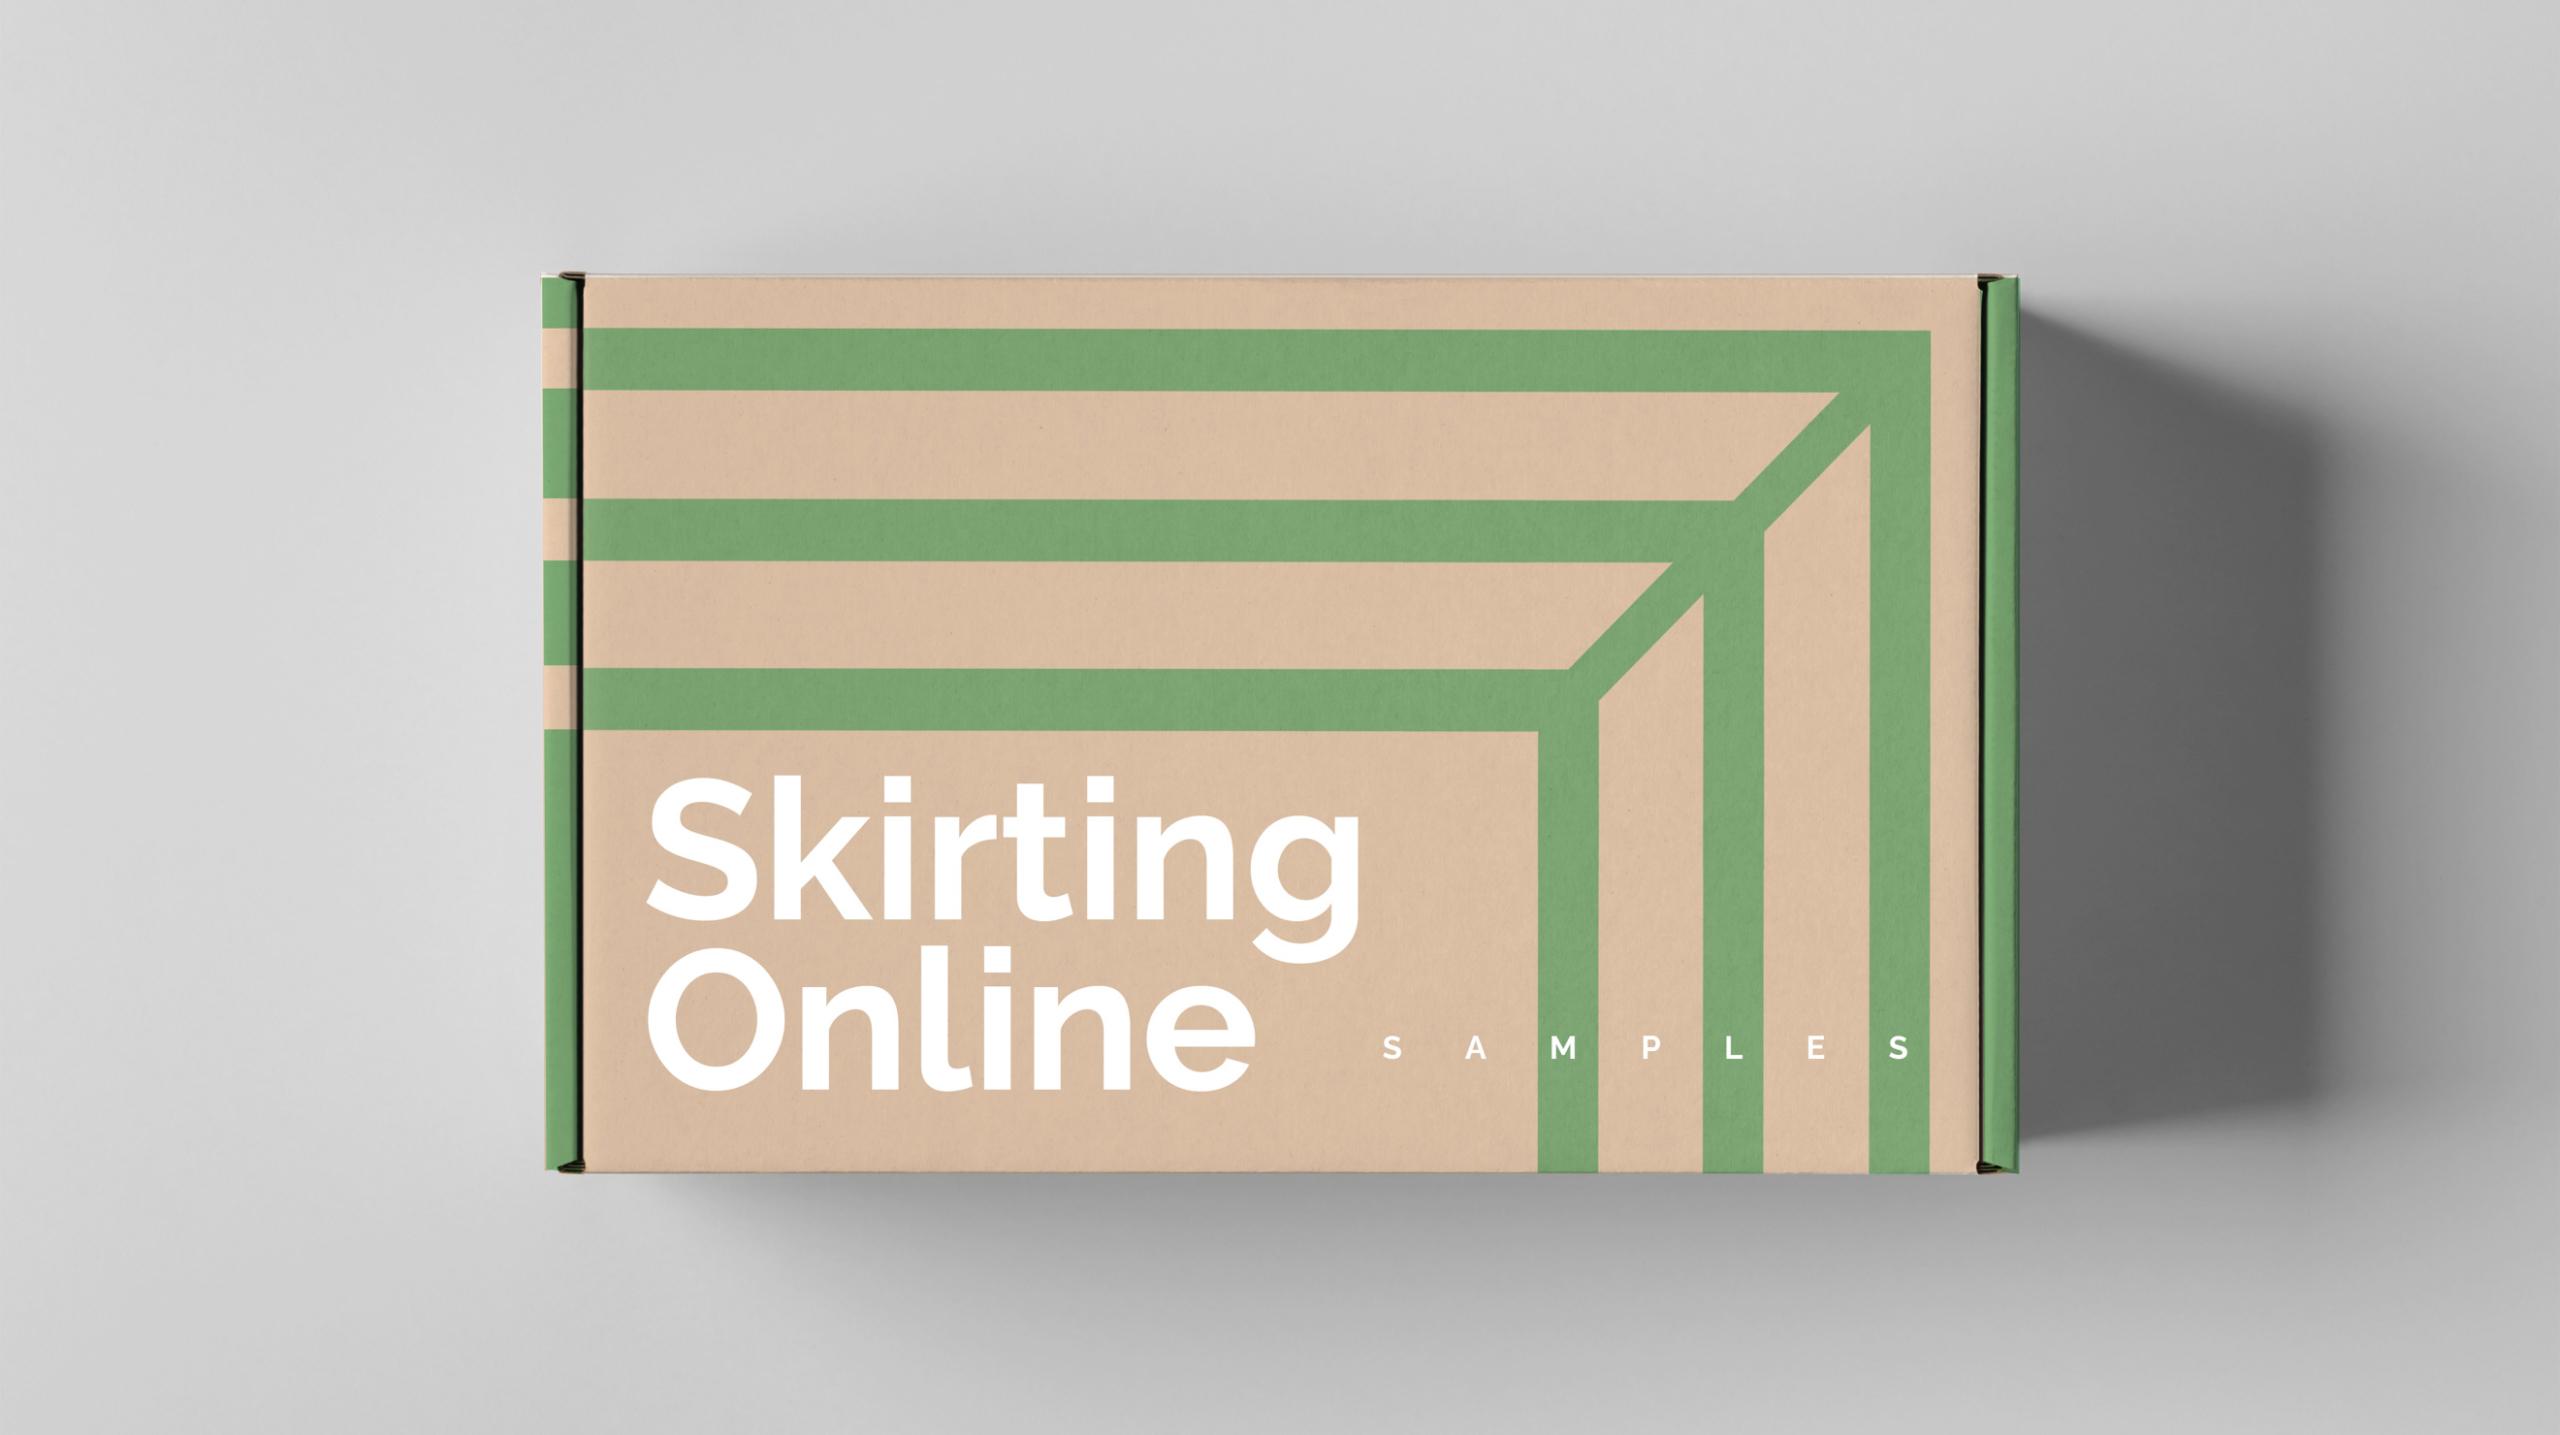 Skirting Onlline - Brand